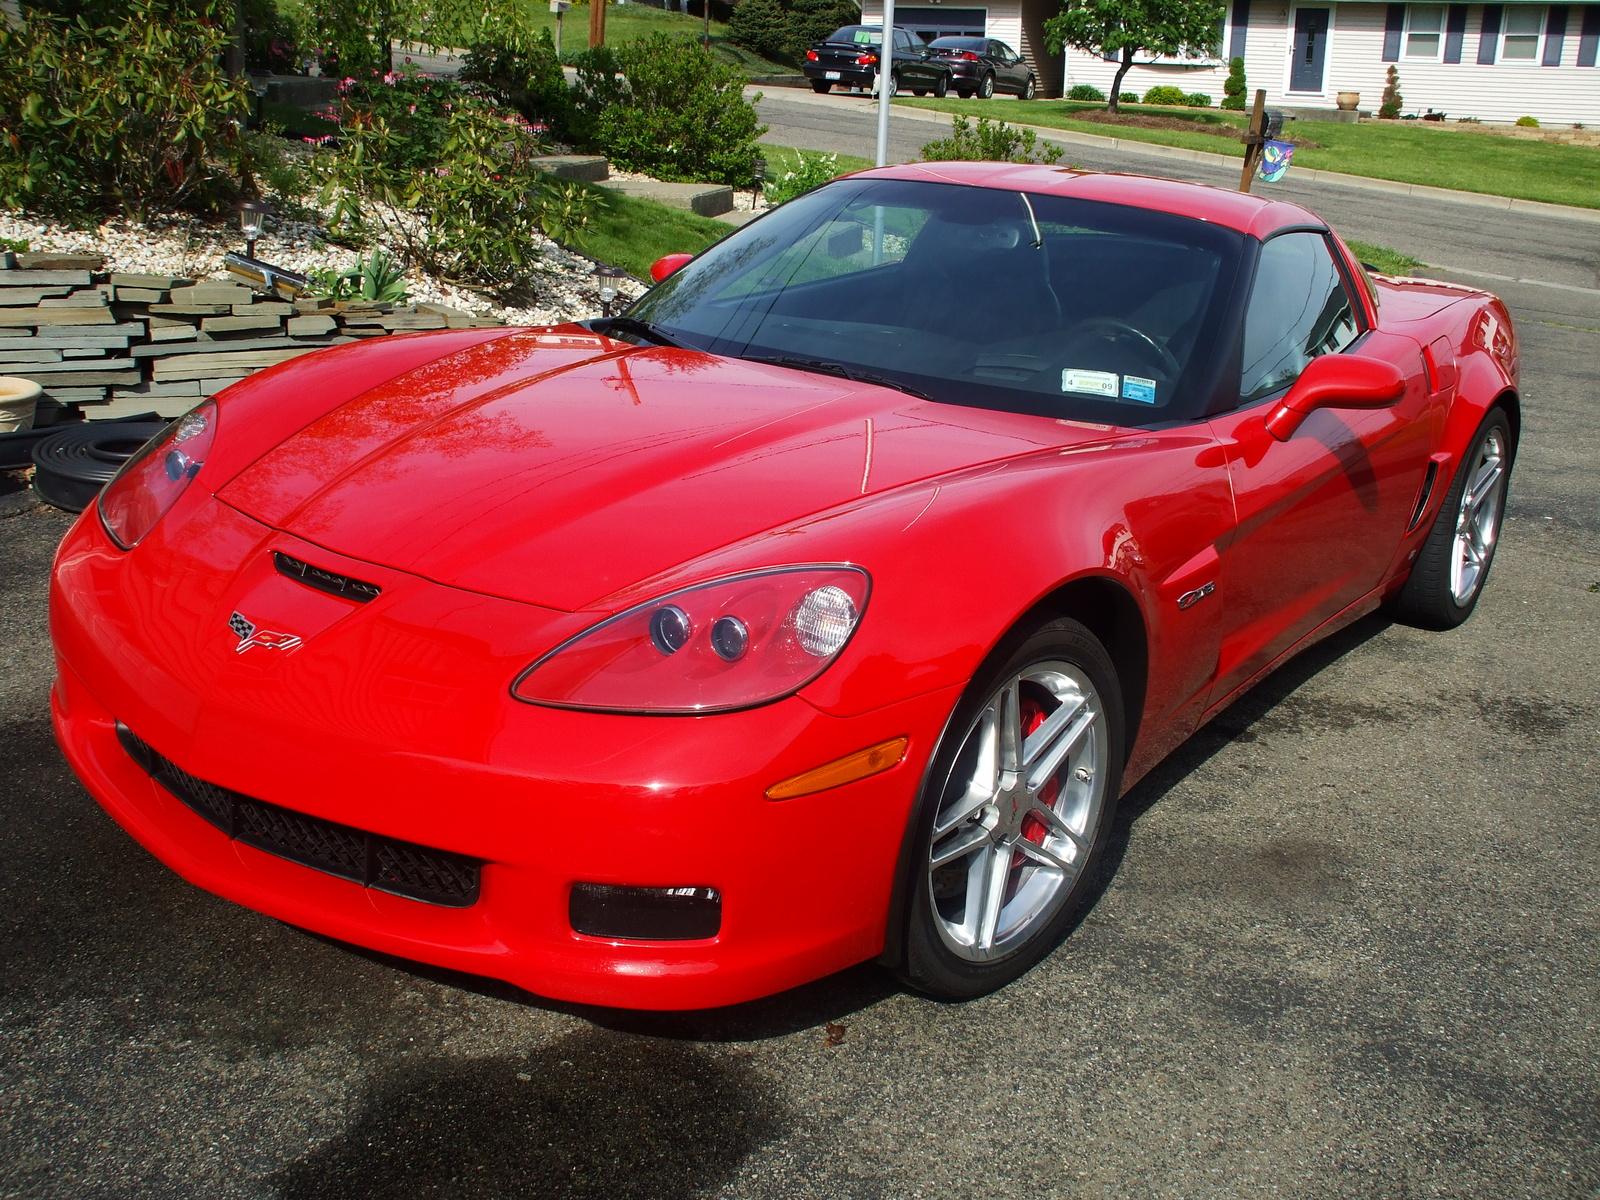 2001 chevrolet corvette z06 used car reviews motor trend autos post. Black Bedroom Furniture Sets. Home Design Ideas